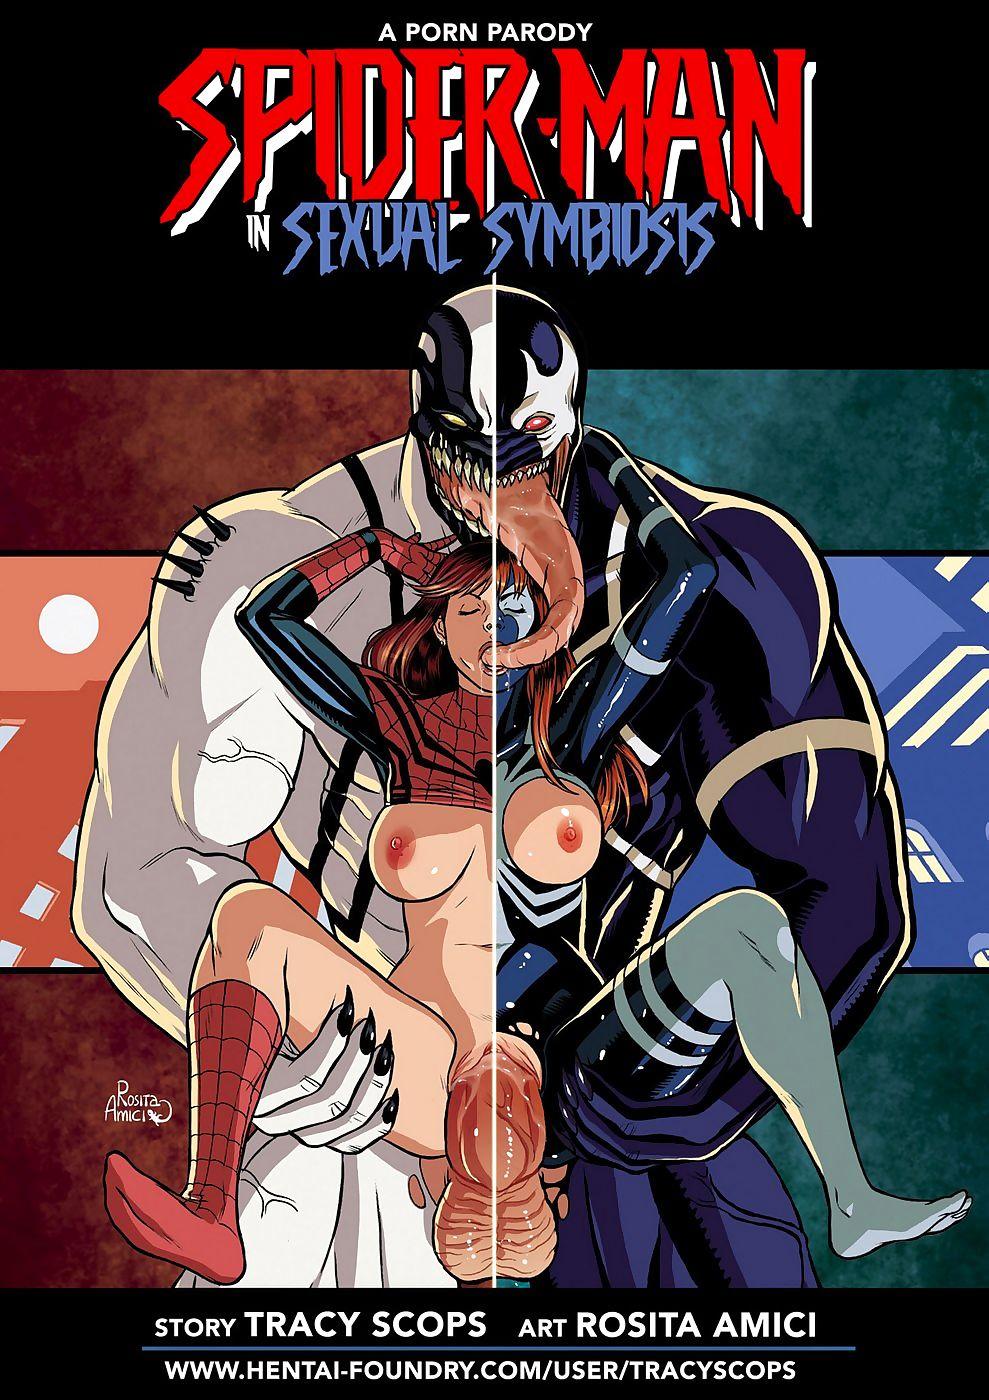 Spider-Man Bodily Symbiosis 1